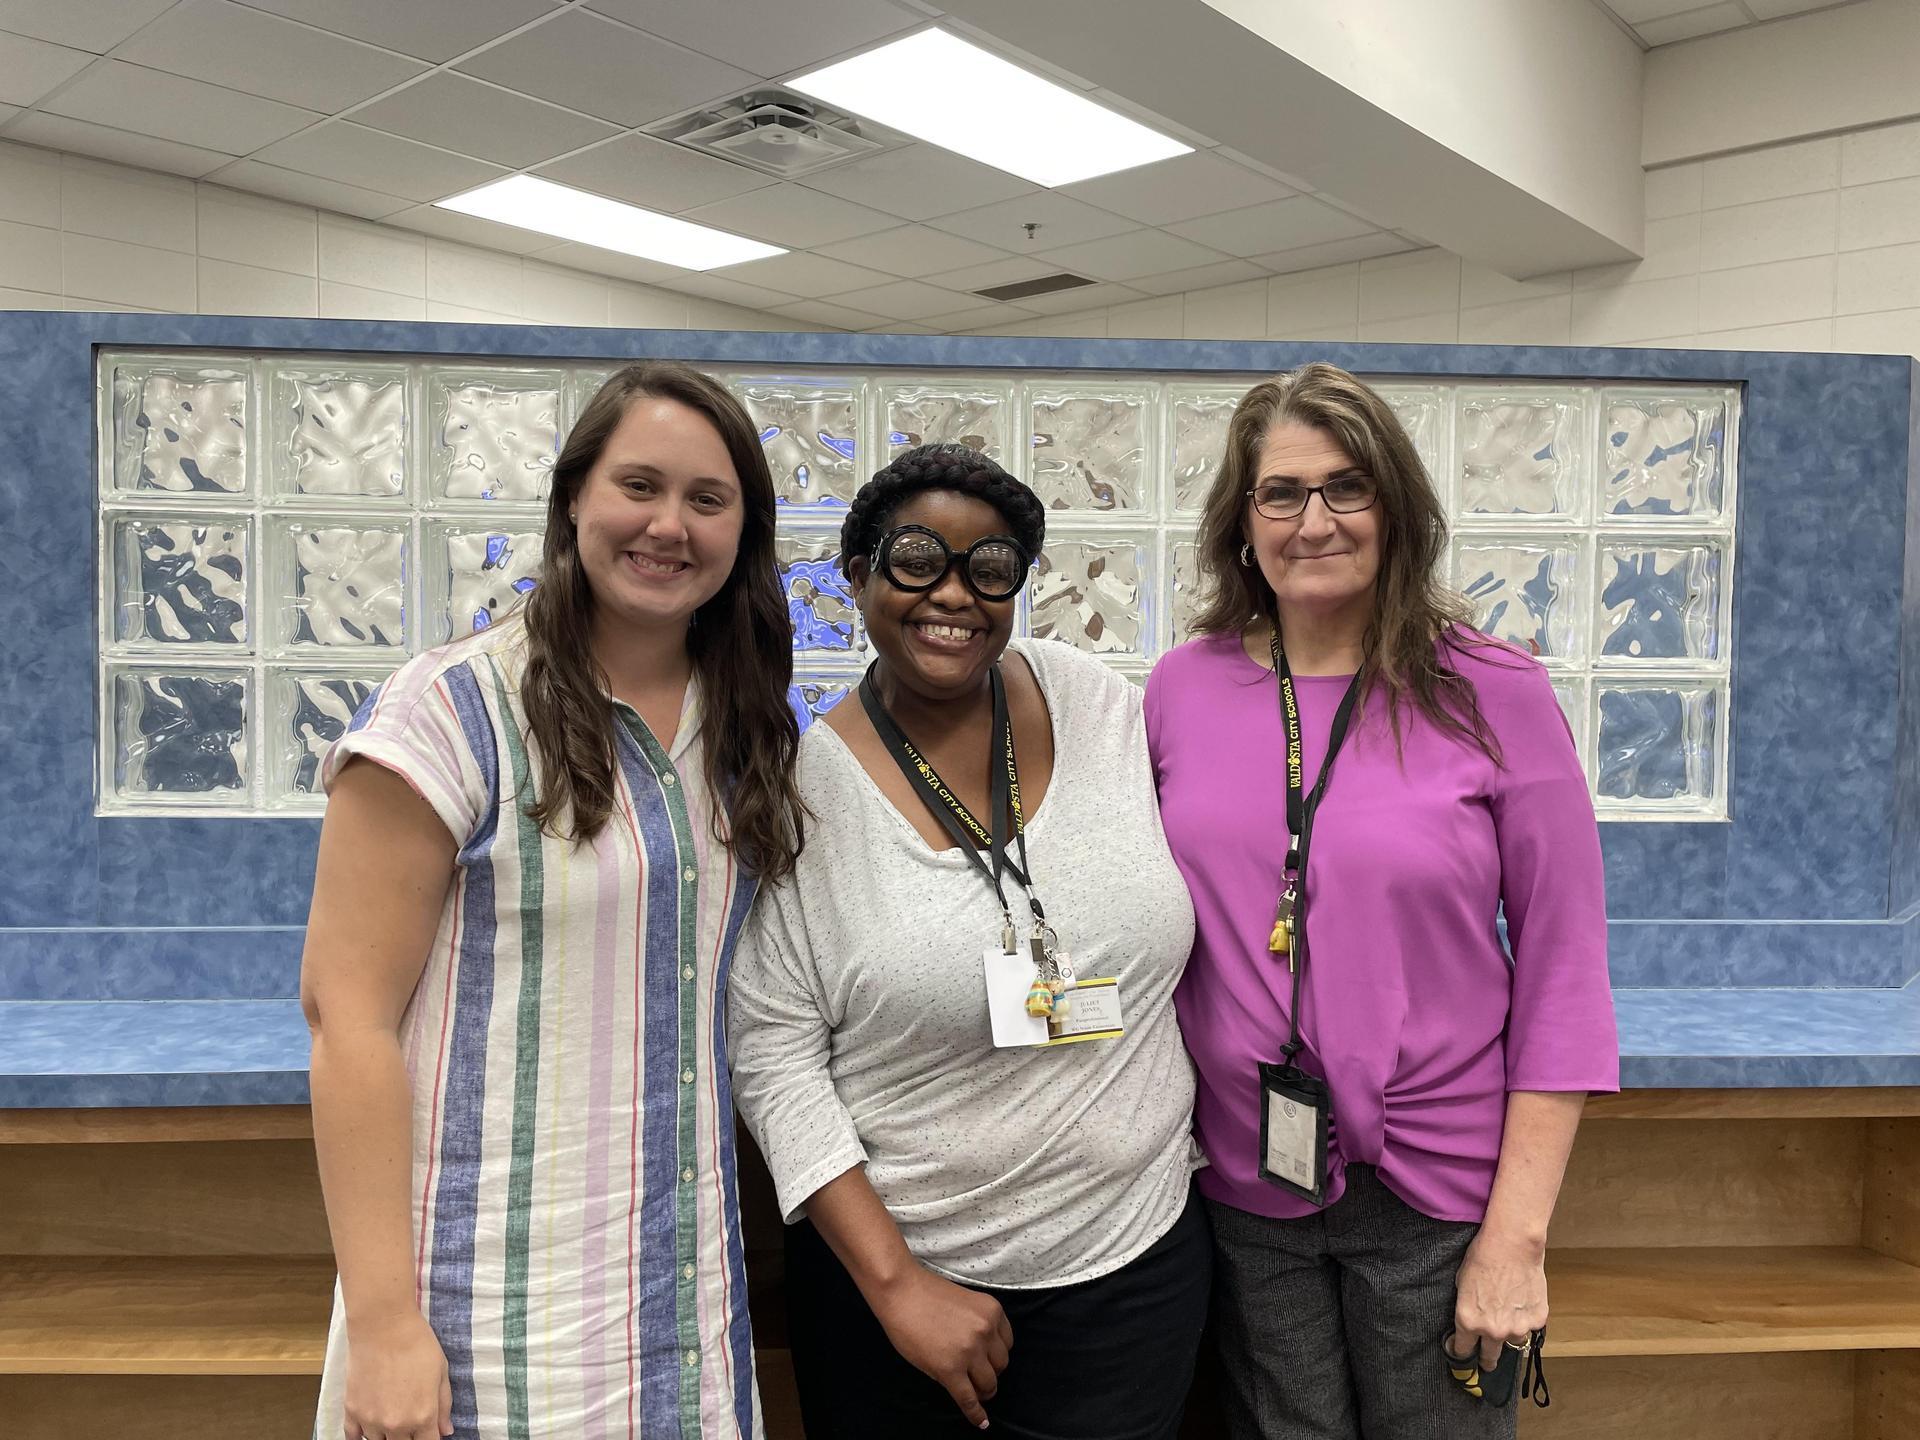 Ms. Unger (left), Ms. Jones (center), Ms. Mackinzie (right)